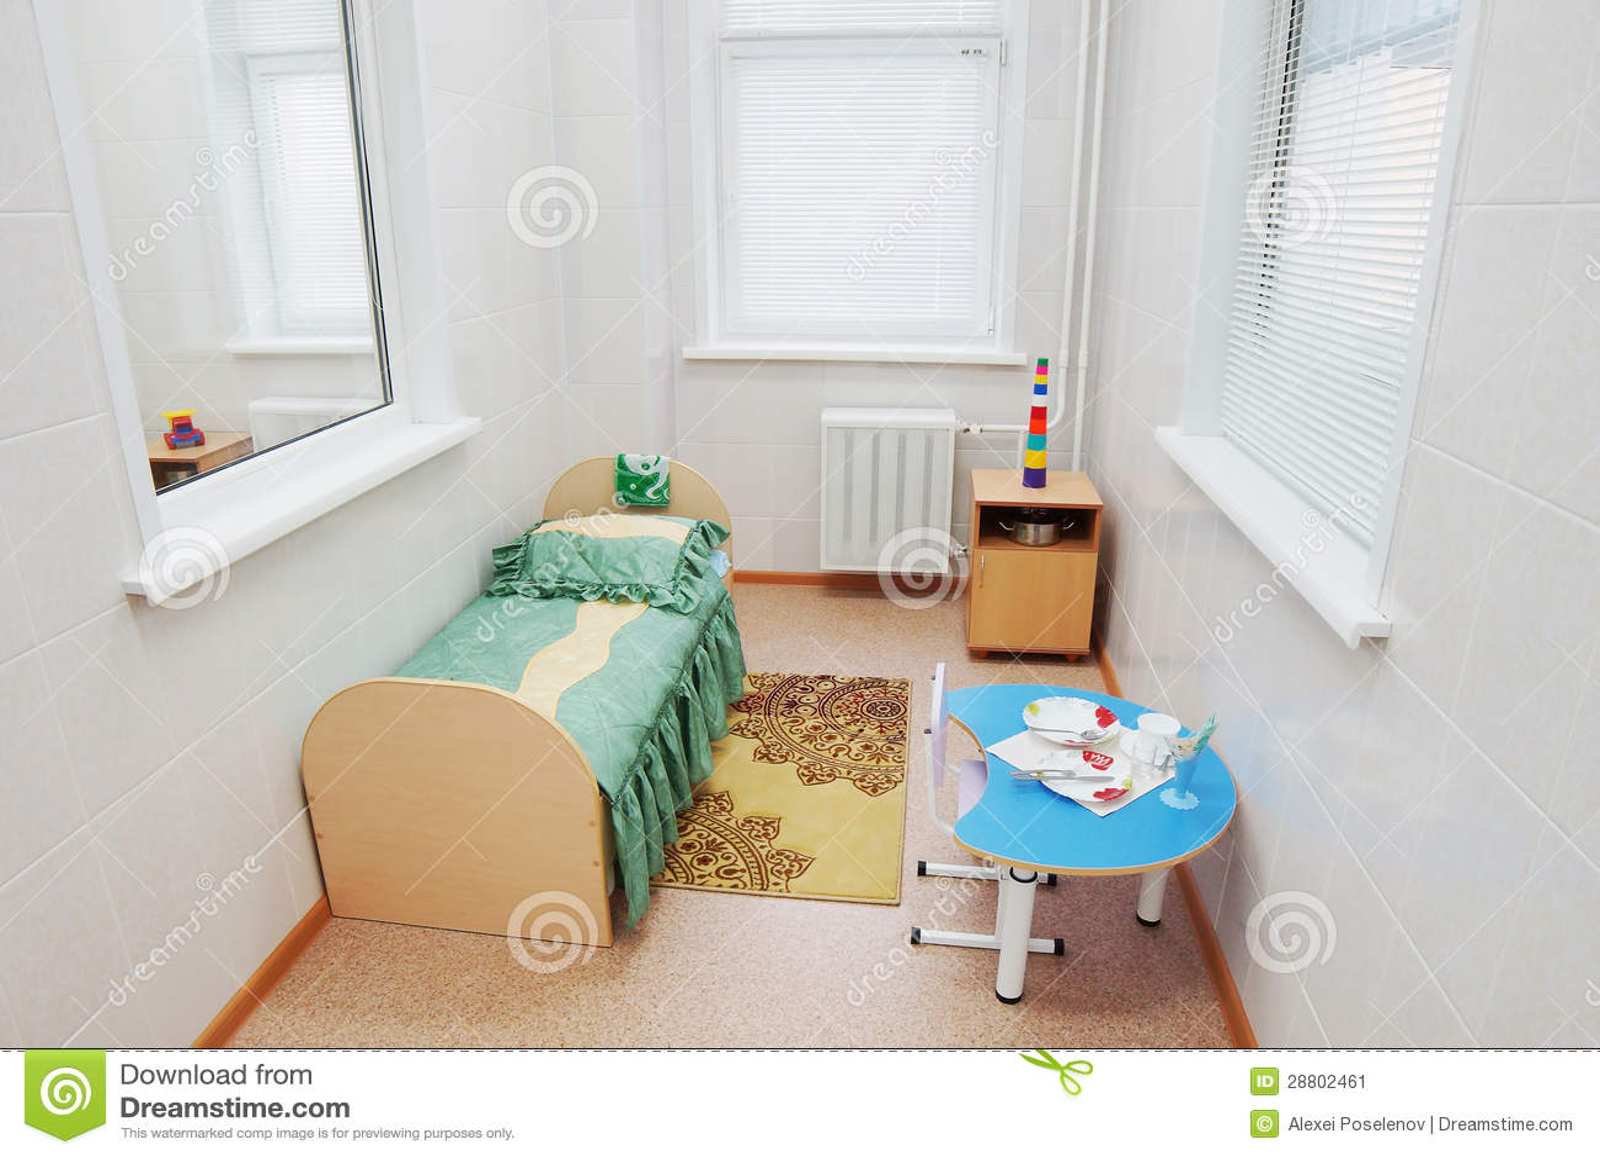 Individual Ward In A Pediatric Hospital